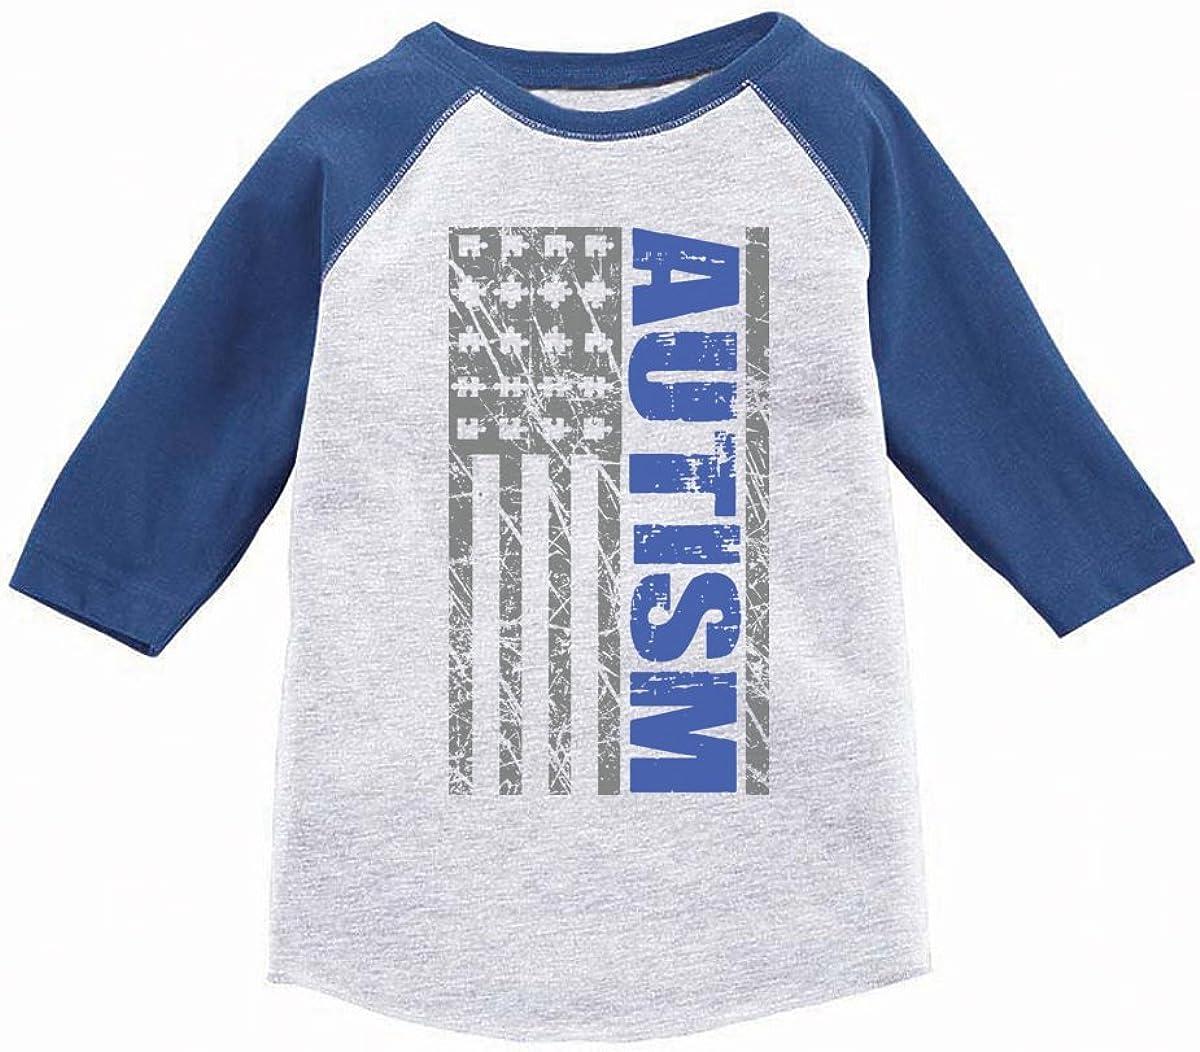 Awkward Styles Toddler Autism Shirt USA Autism Flag Boys Girls Autism Shirt